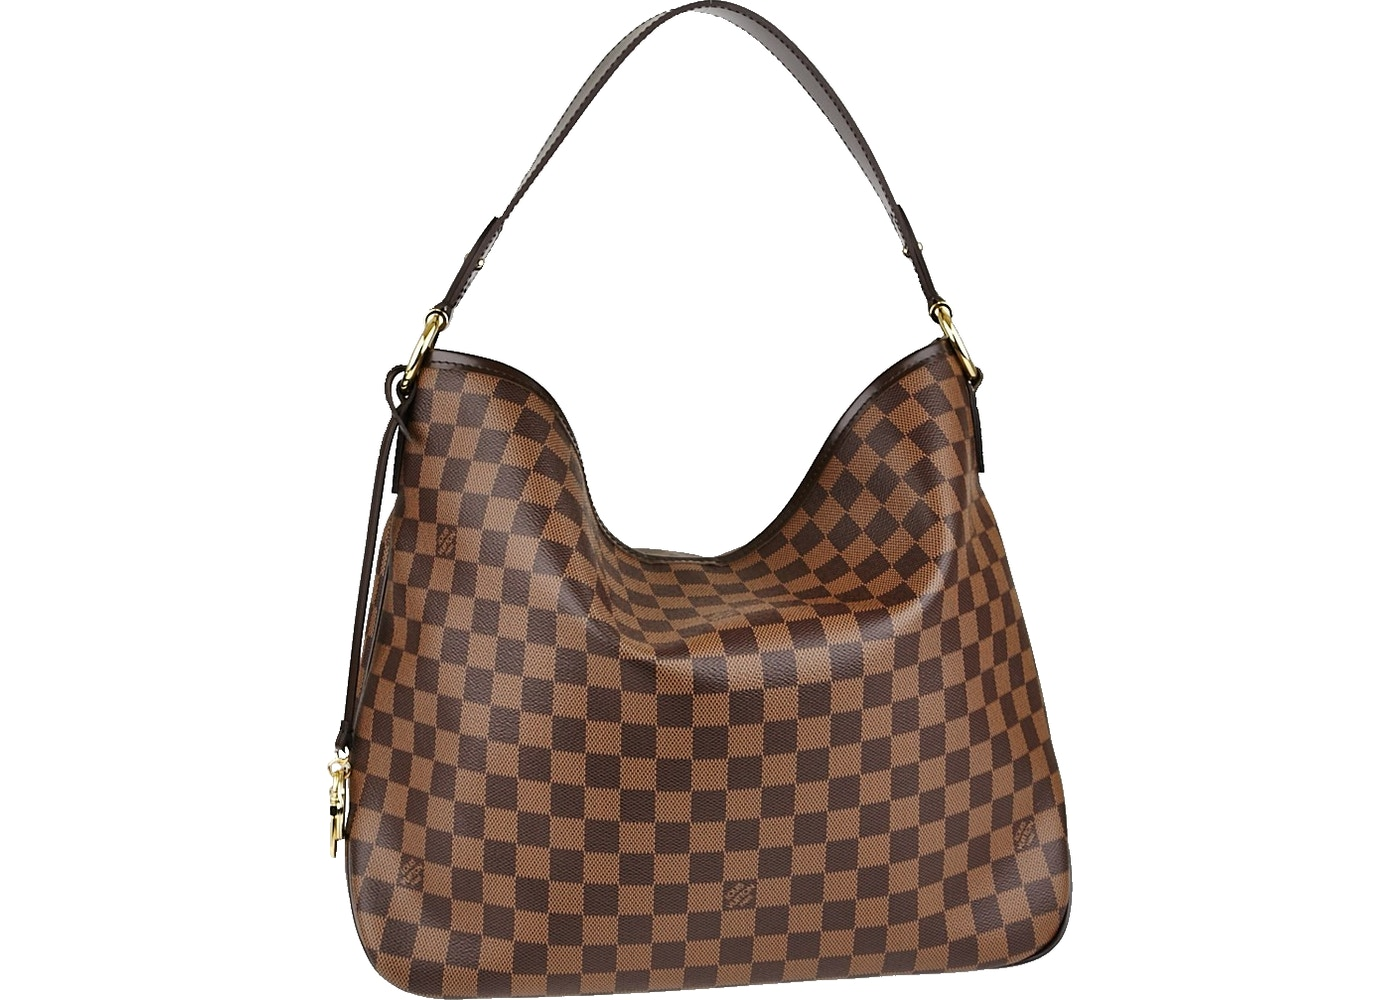 Louis Vuitton Delightful Nm Damier Ebene MM Brown 5e9717f74c89